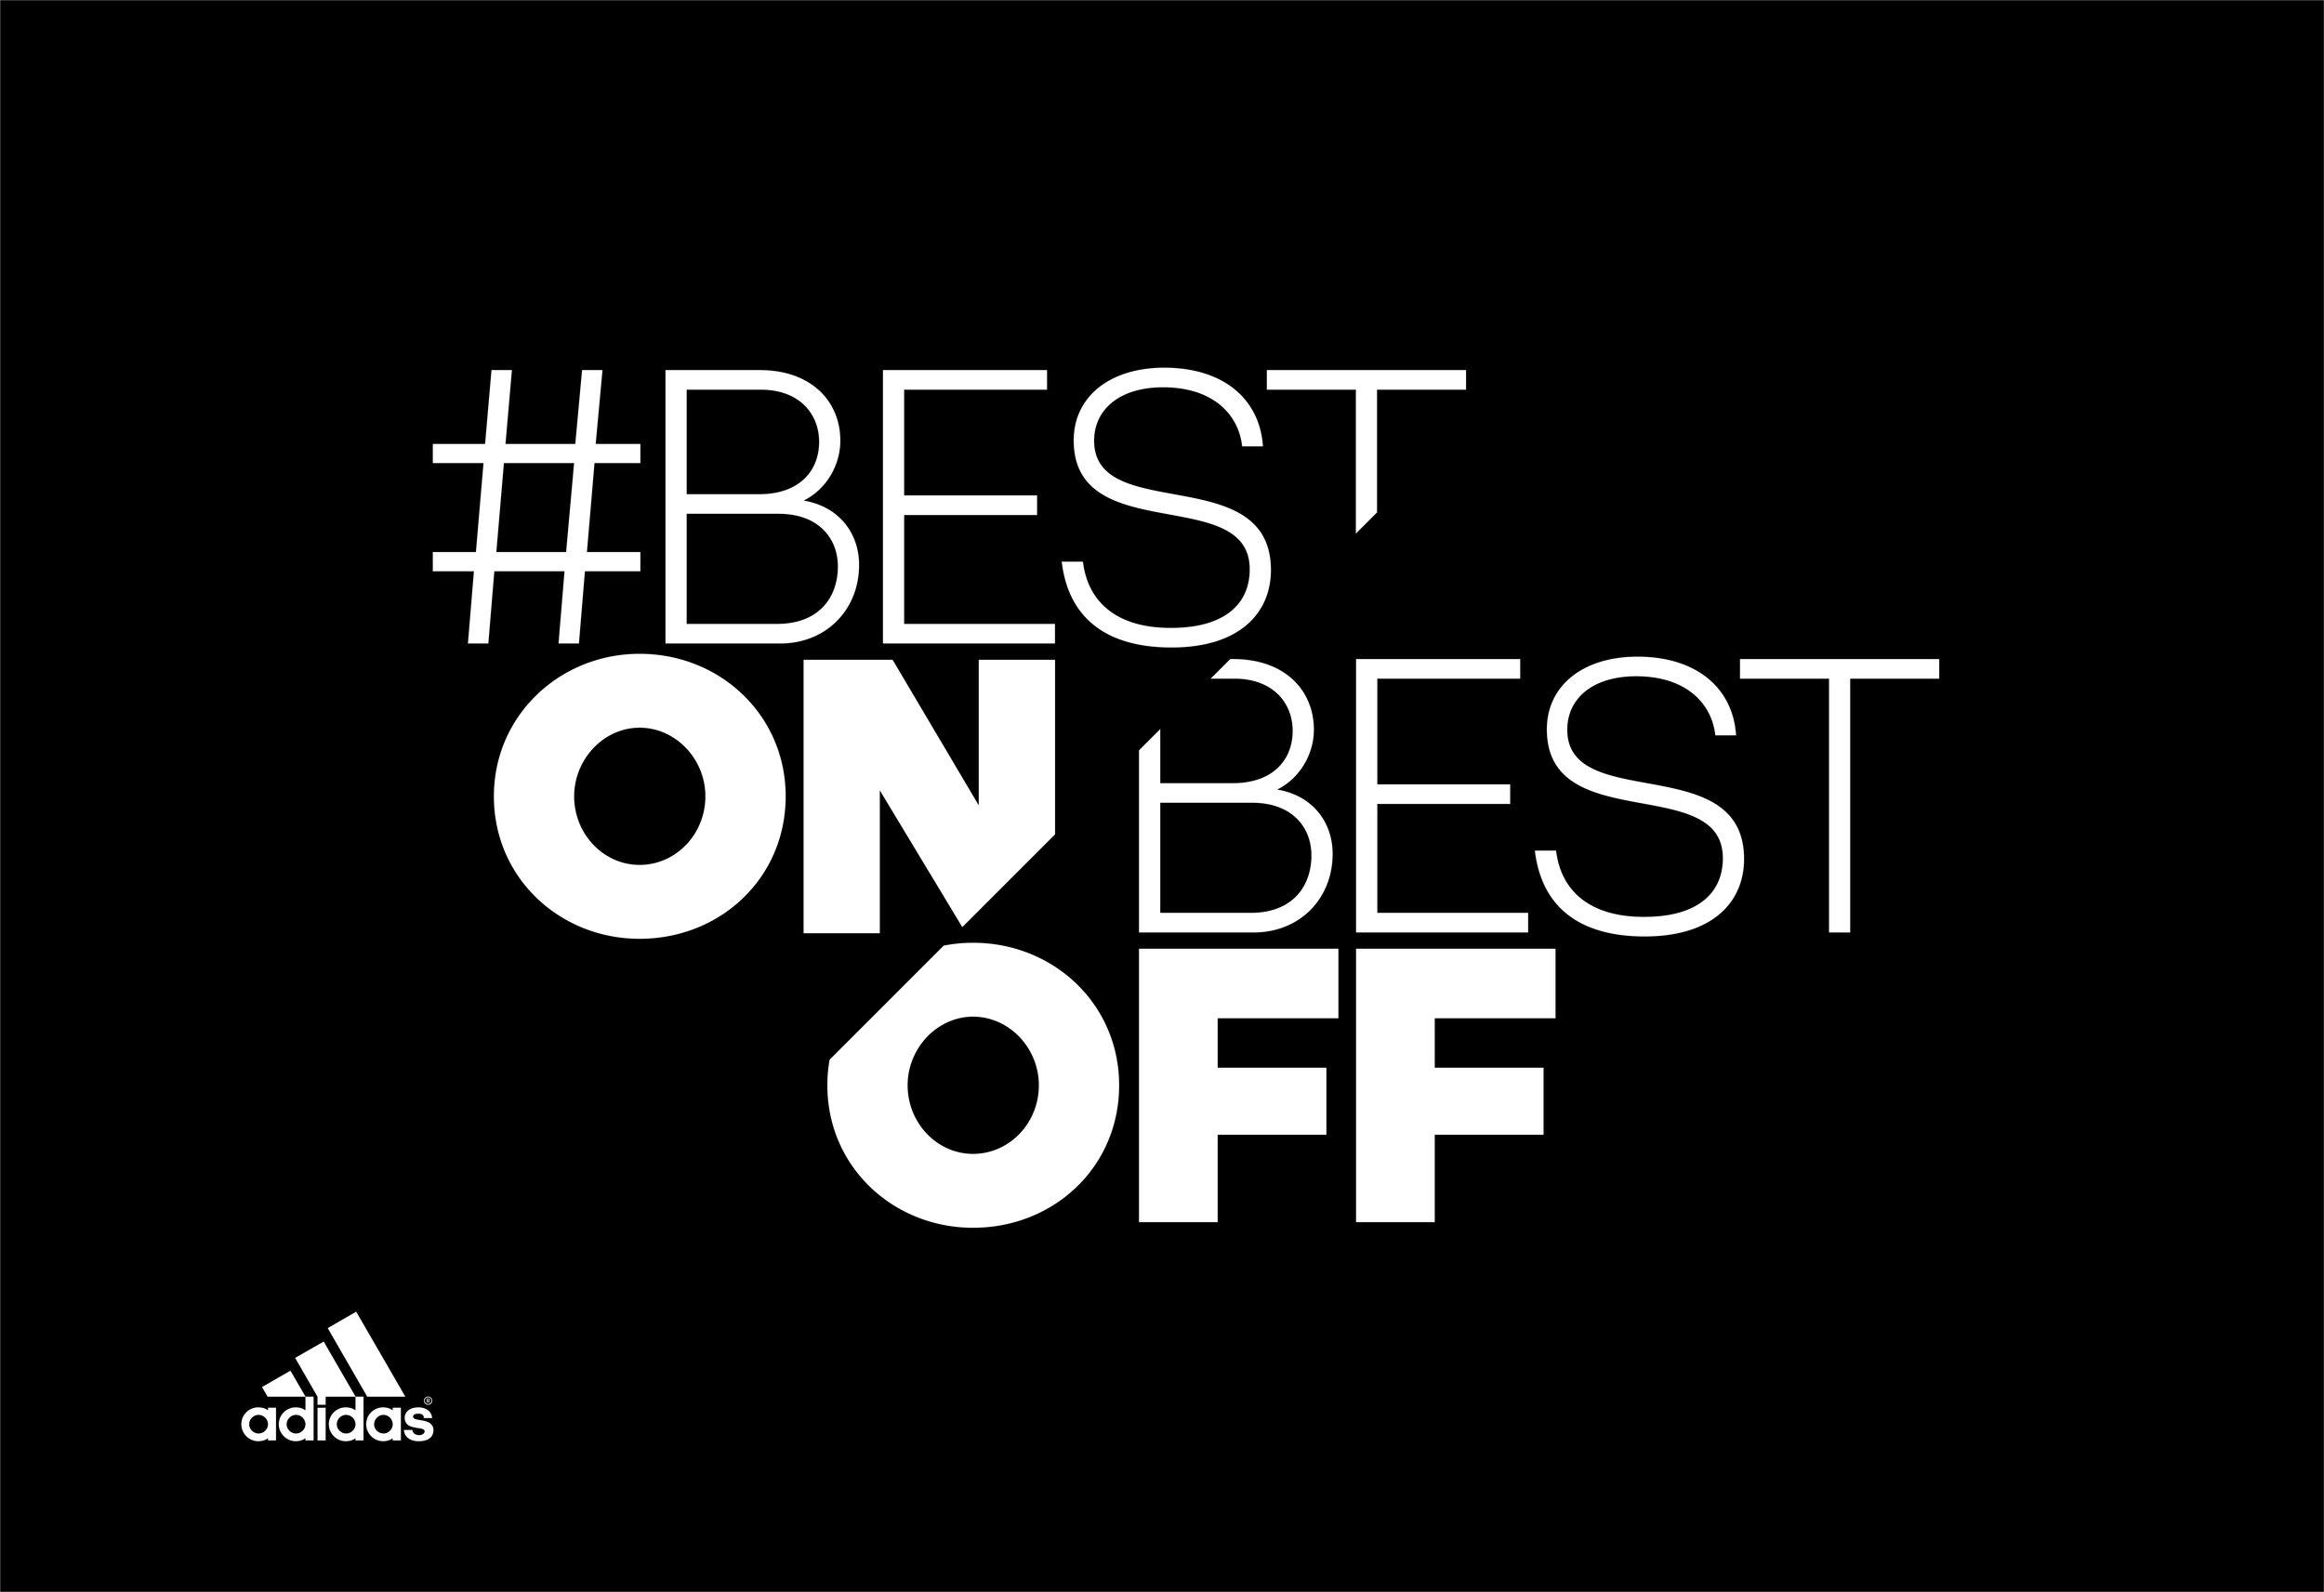 Adidas Best On Best Off logo